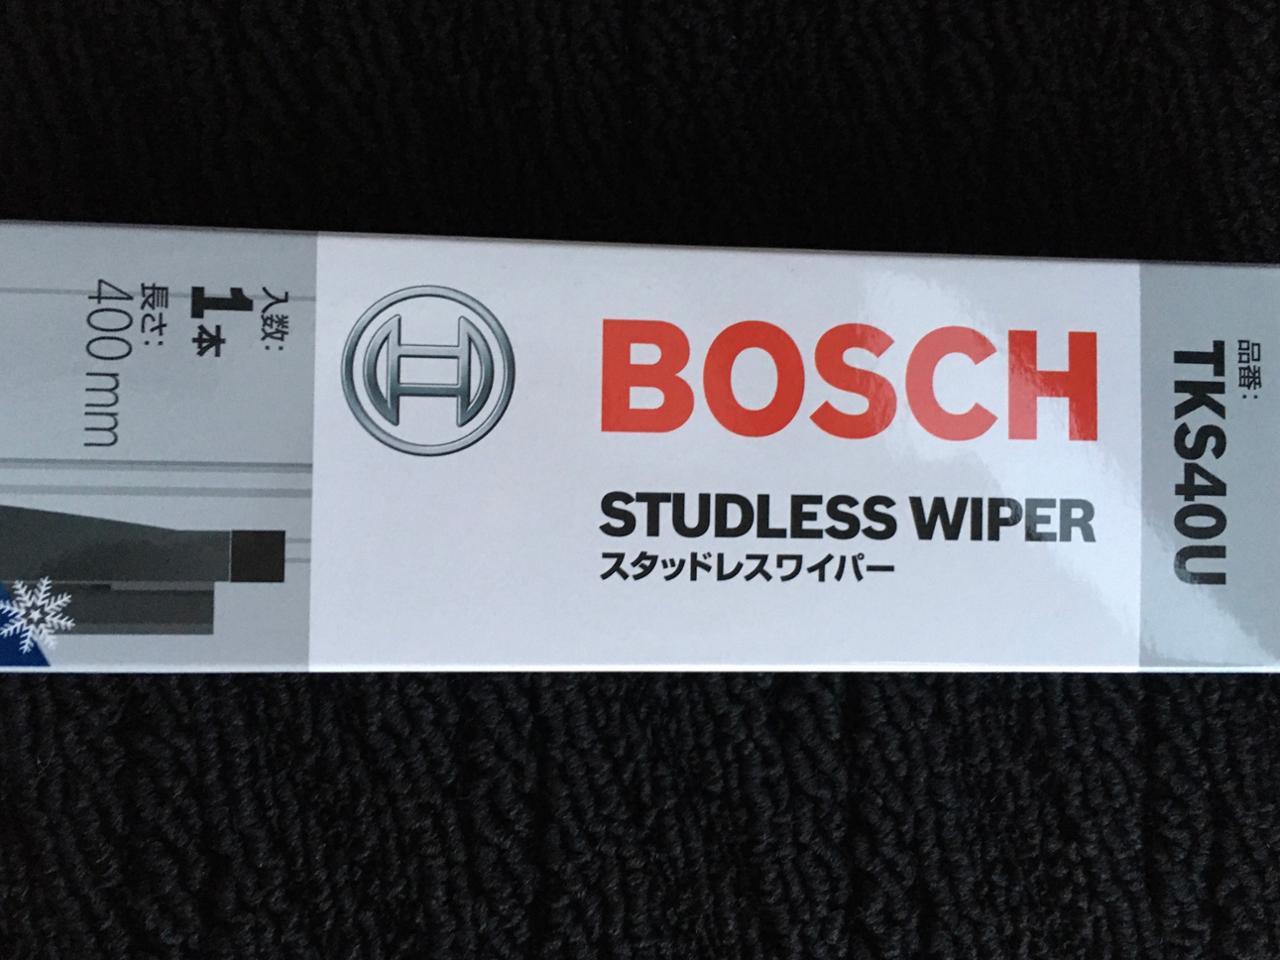 BOSCH スタッドレスワイパー